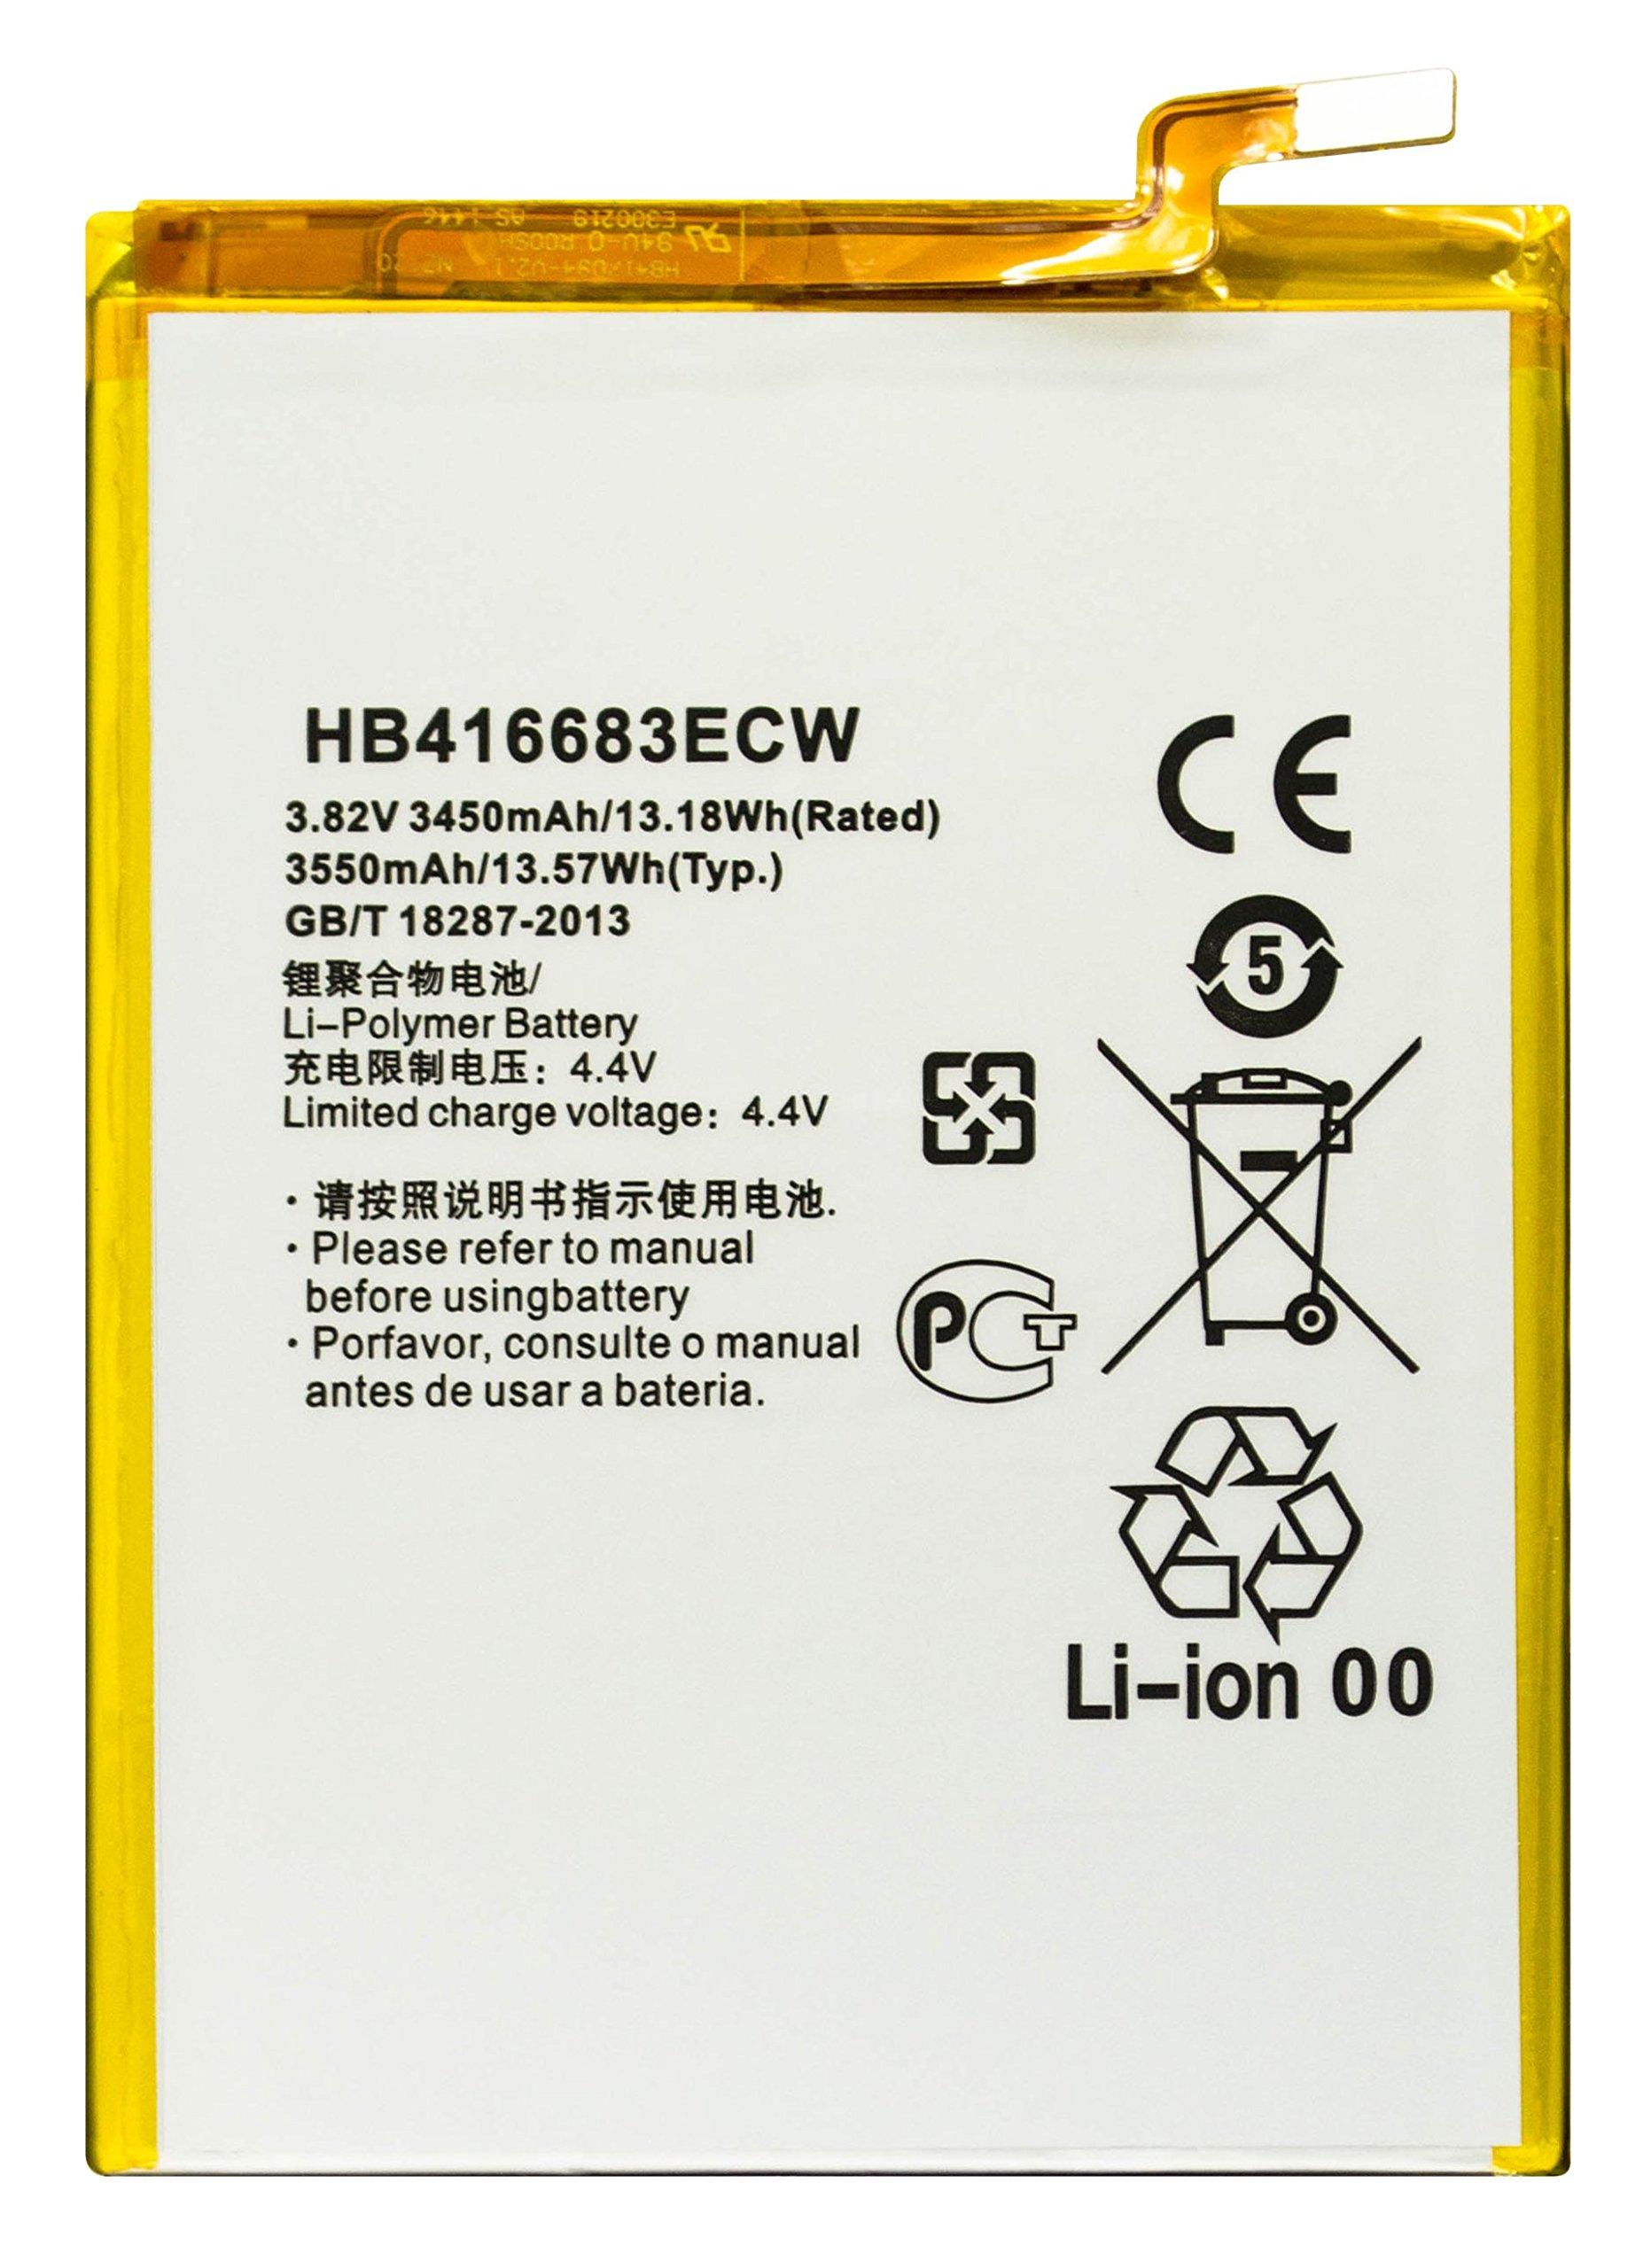 Bateria Celular Bastex Para Google Nexus 6p H1511 & H1512 3.82v 3450mah 13.18wh Li Polymer Con Free Tool Kit Para Huawei